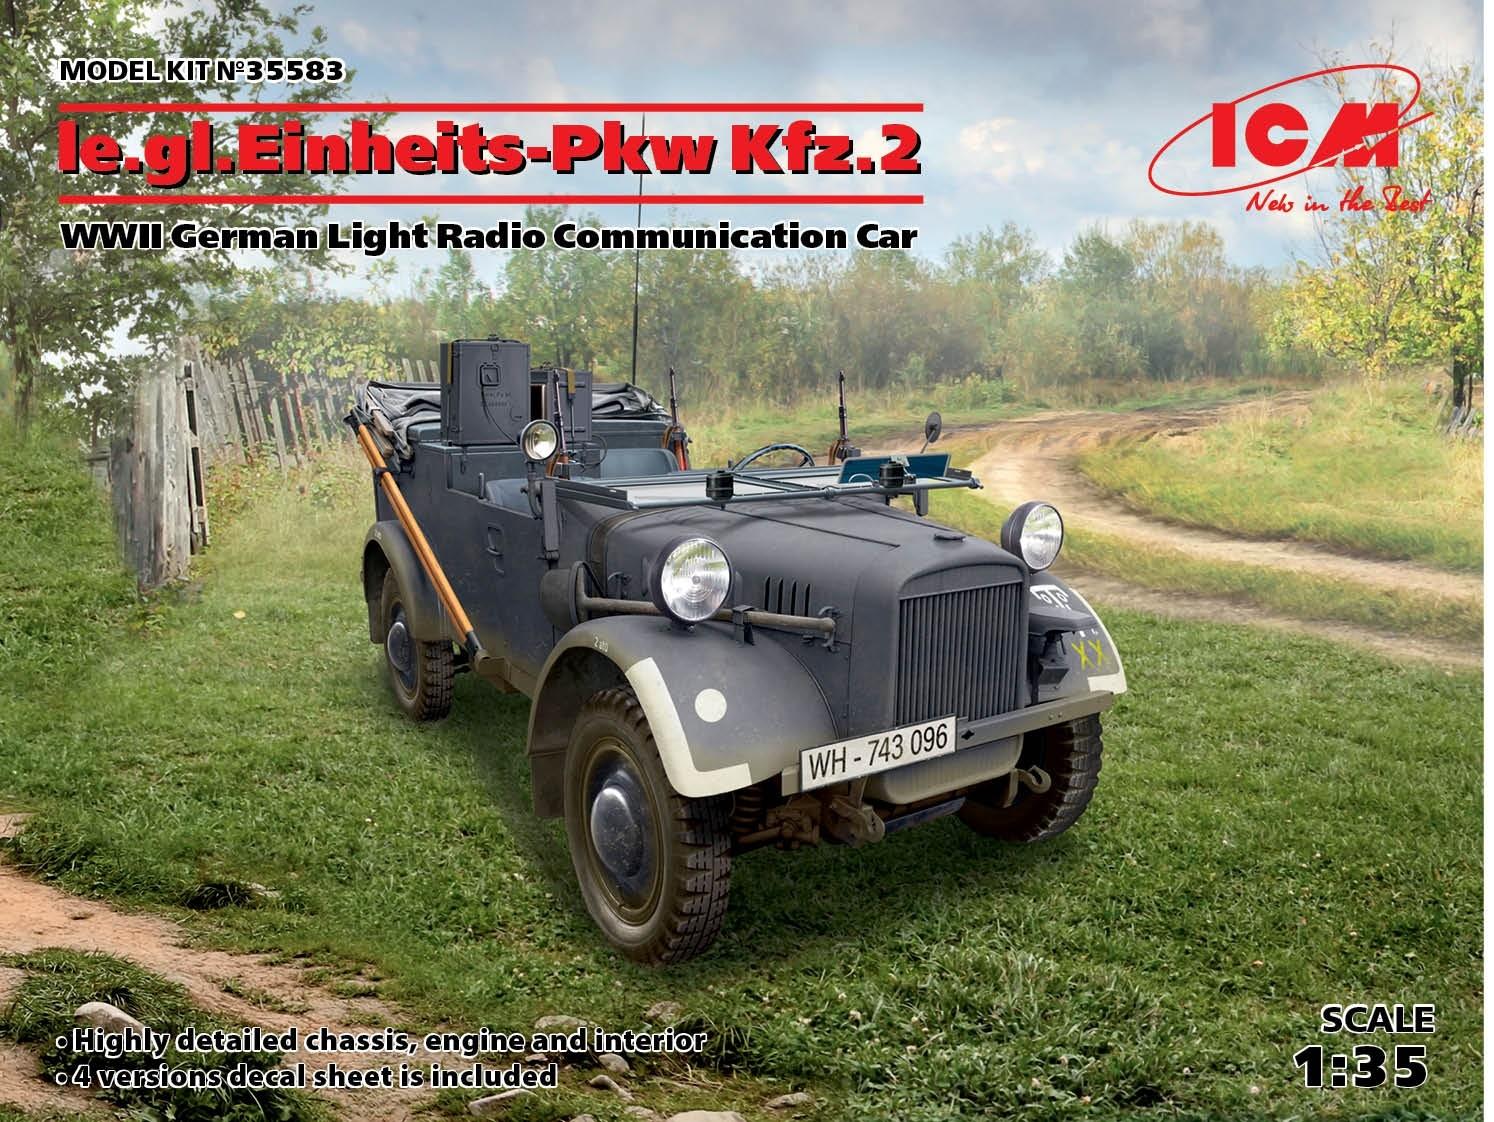 le.gl.Einheitz-Pkw Kfz.2, WWII German Light Radio Communication Car